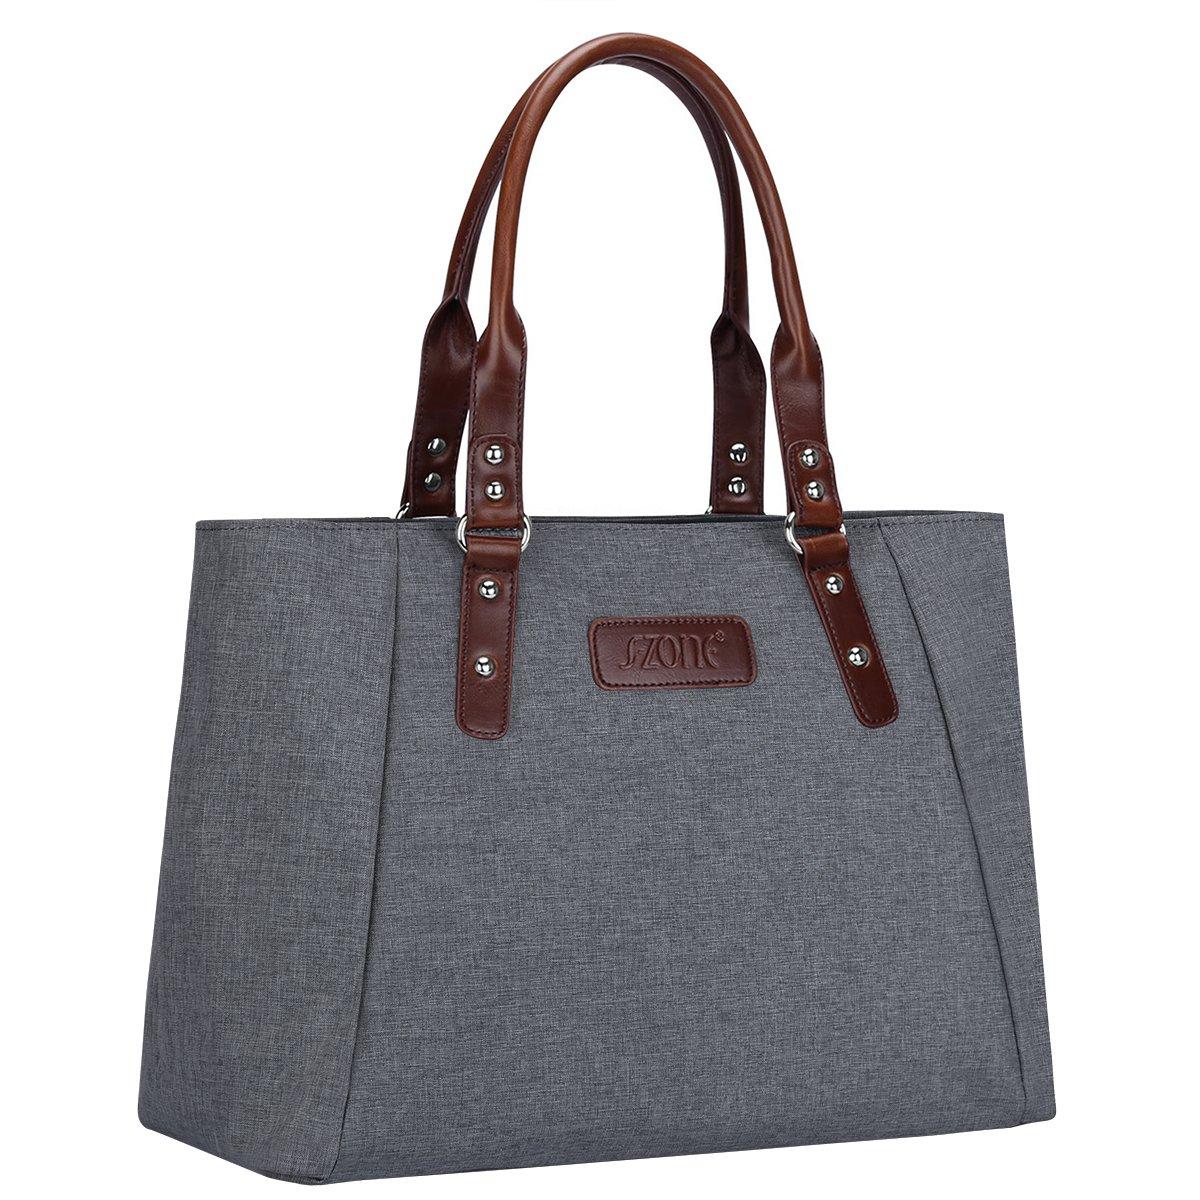 S-ZONE Women's Handbags Lightweight Large Tote Casual Work Bag (Grey)